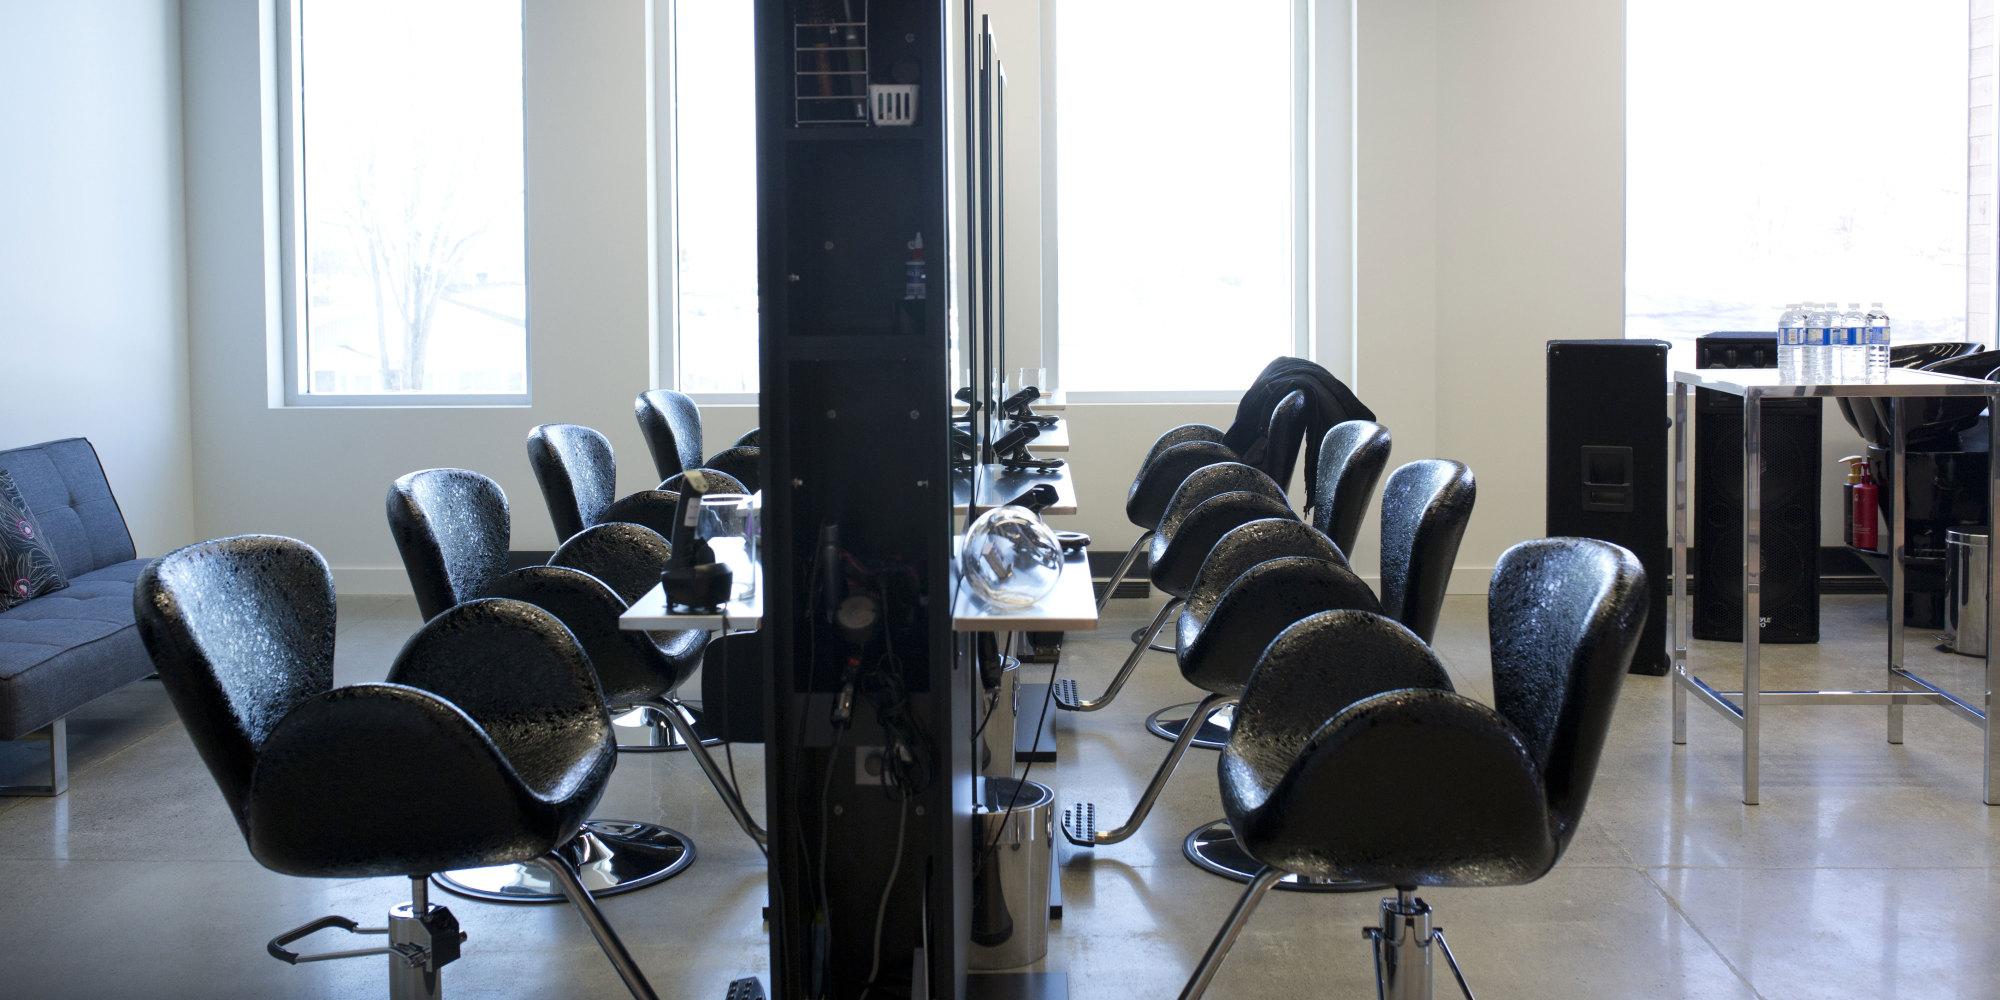 Notre top 8 des salons de coiffure  Qubec PHOTOS